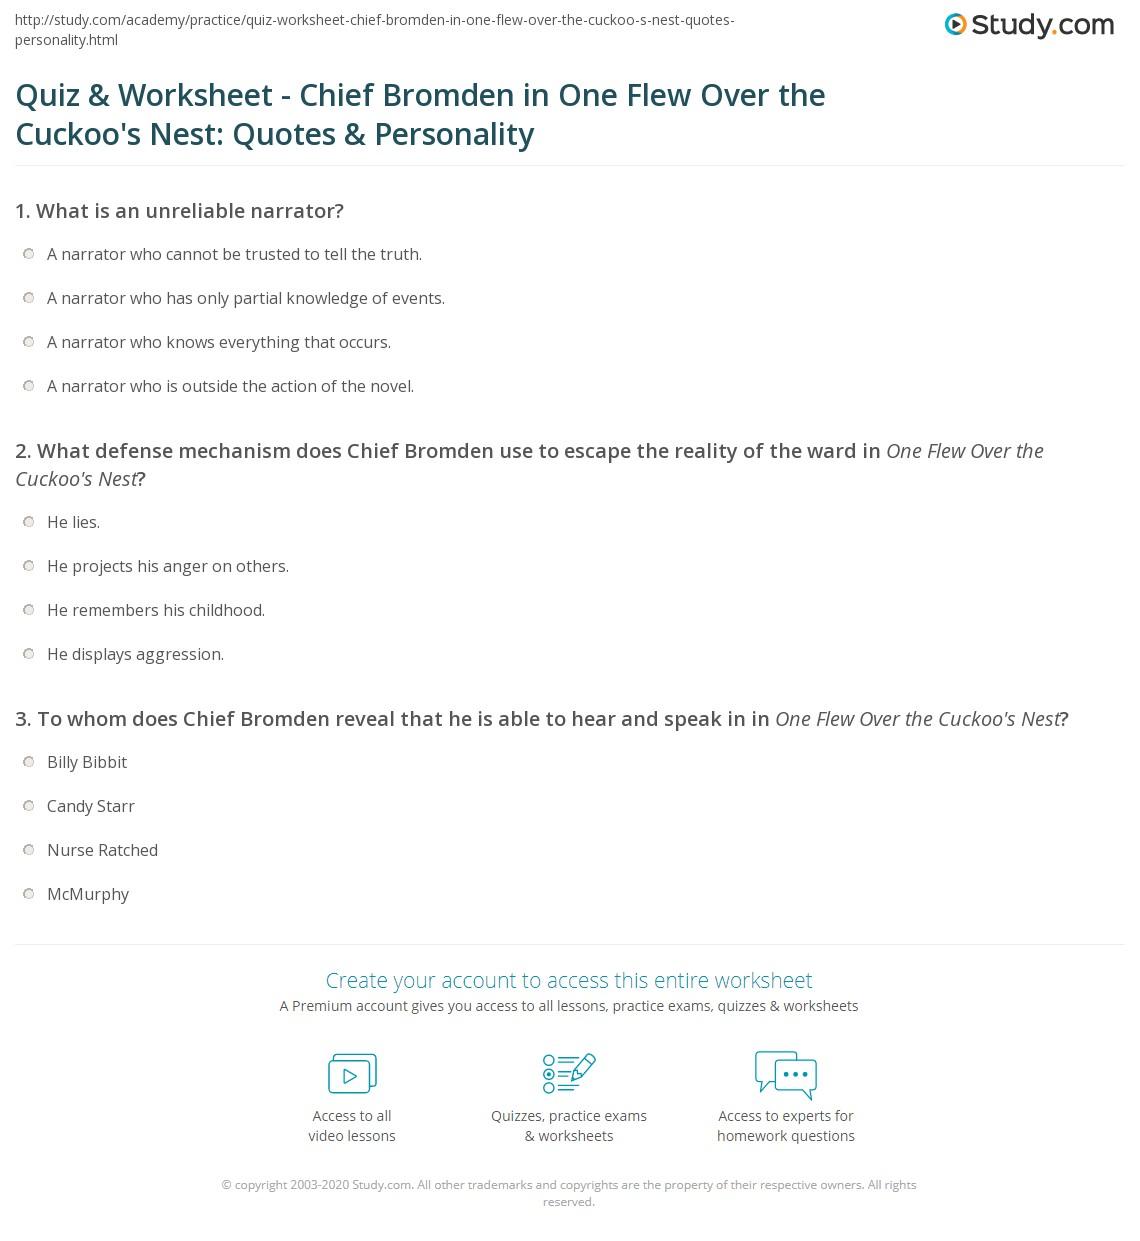 Quiz Worksheet Chief Bromden In One Flew Over The Cuckoo S